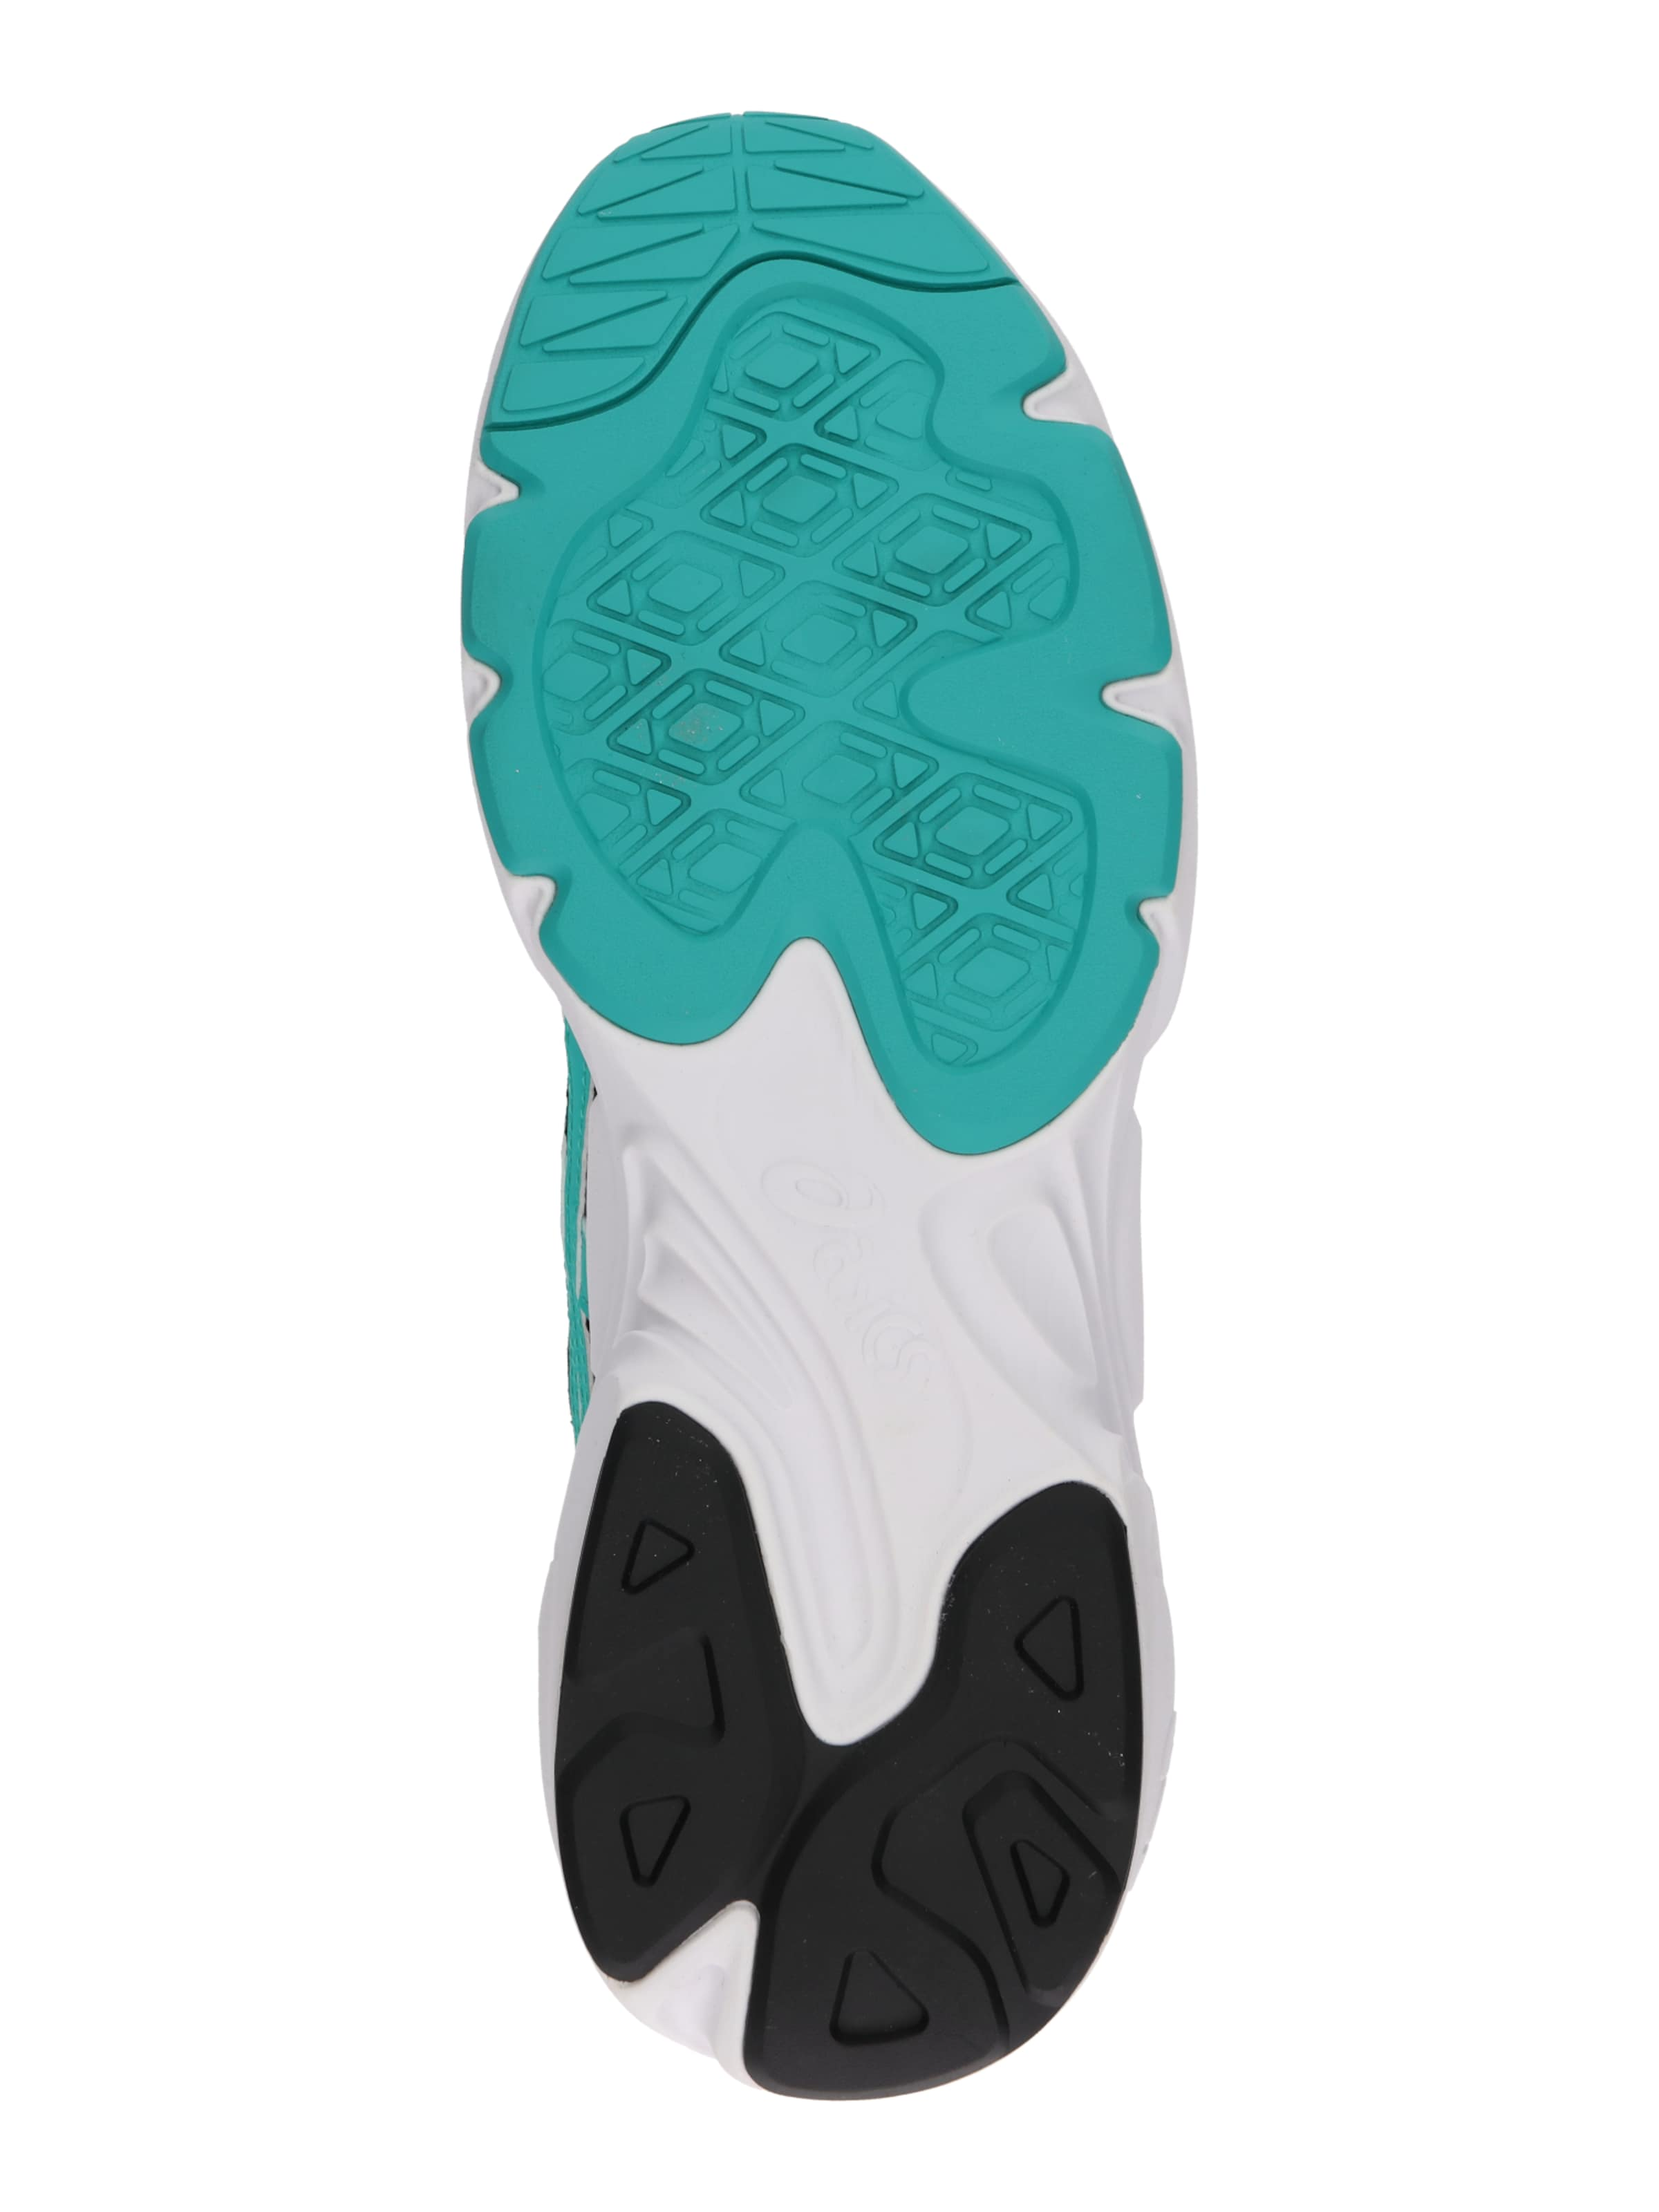 GrünSchwarz In Tiger Asics 'gel bondi' Sneaker wP0knO